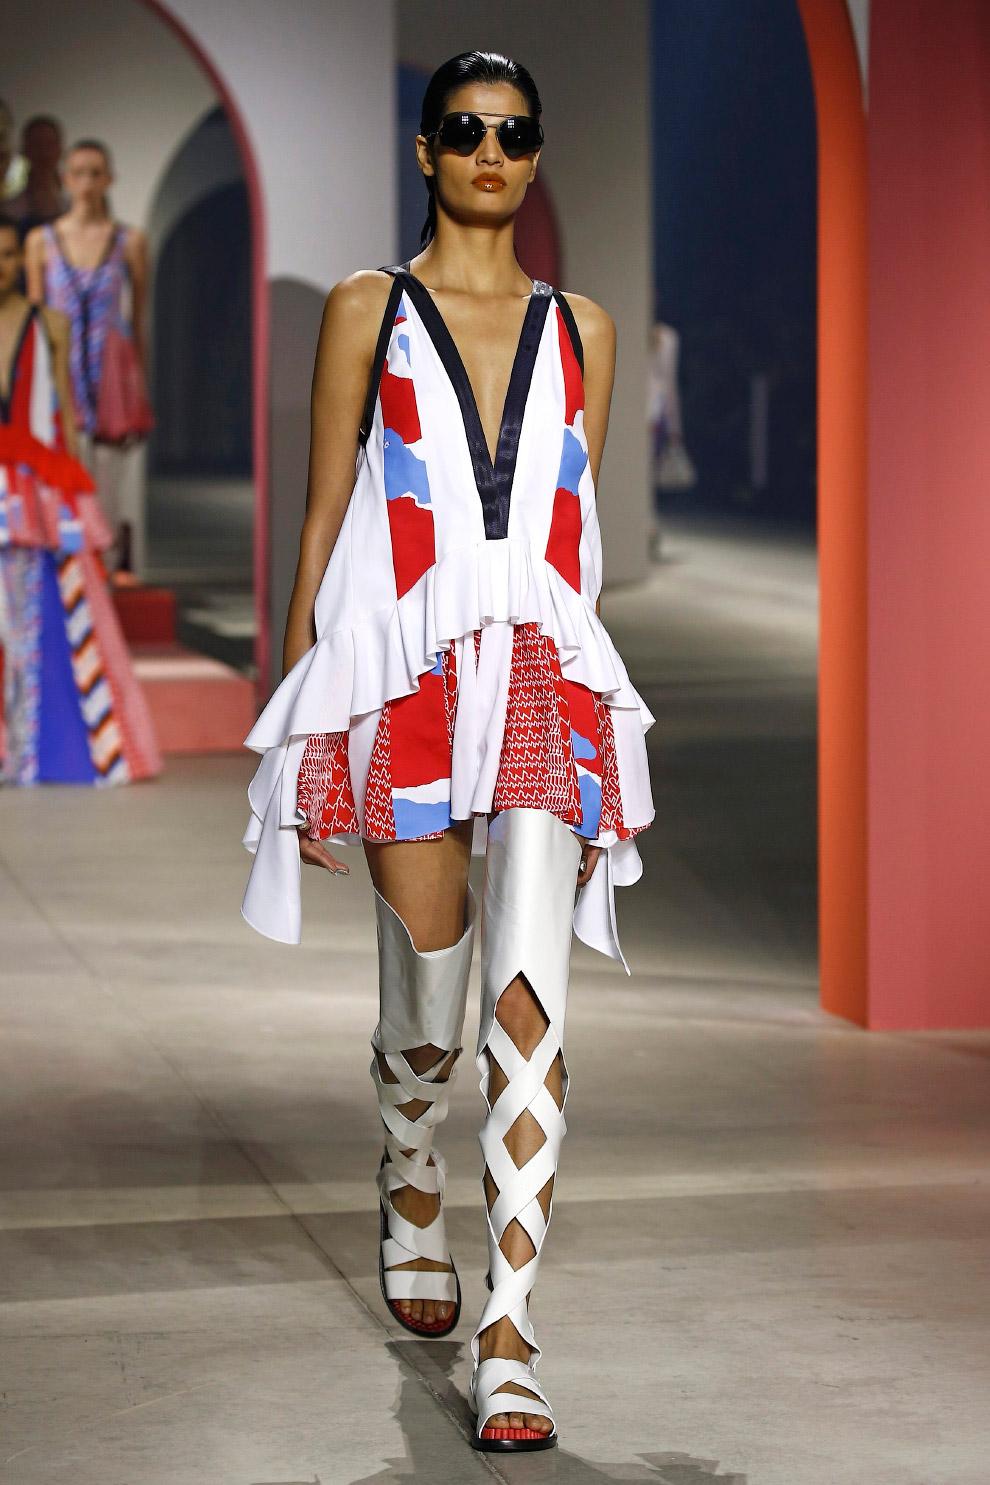 Таким видят сезон весна/лето 2016 американские дизайнеры Умберто Леон и Кэрол Лим